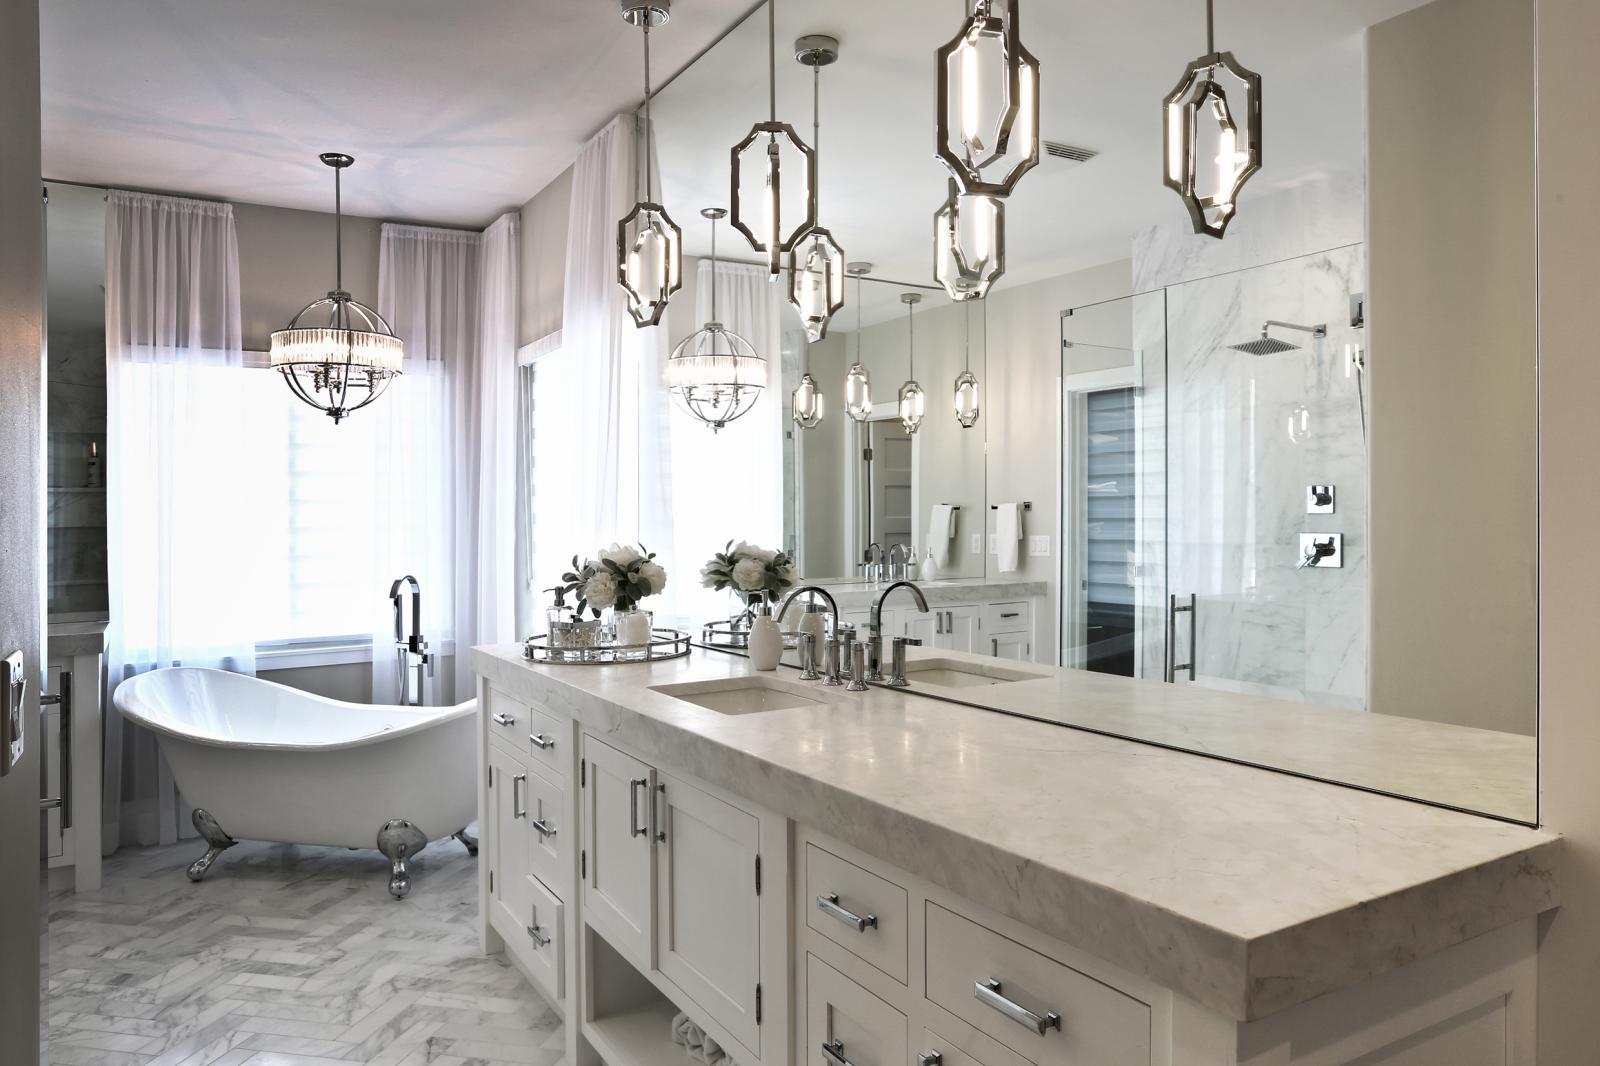 Recent Projects - Bathrooms   YK Stone Center   Denver Colorado